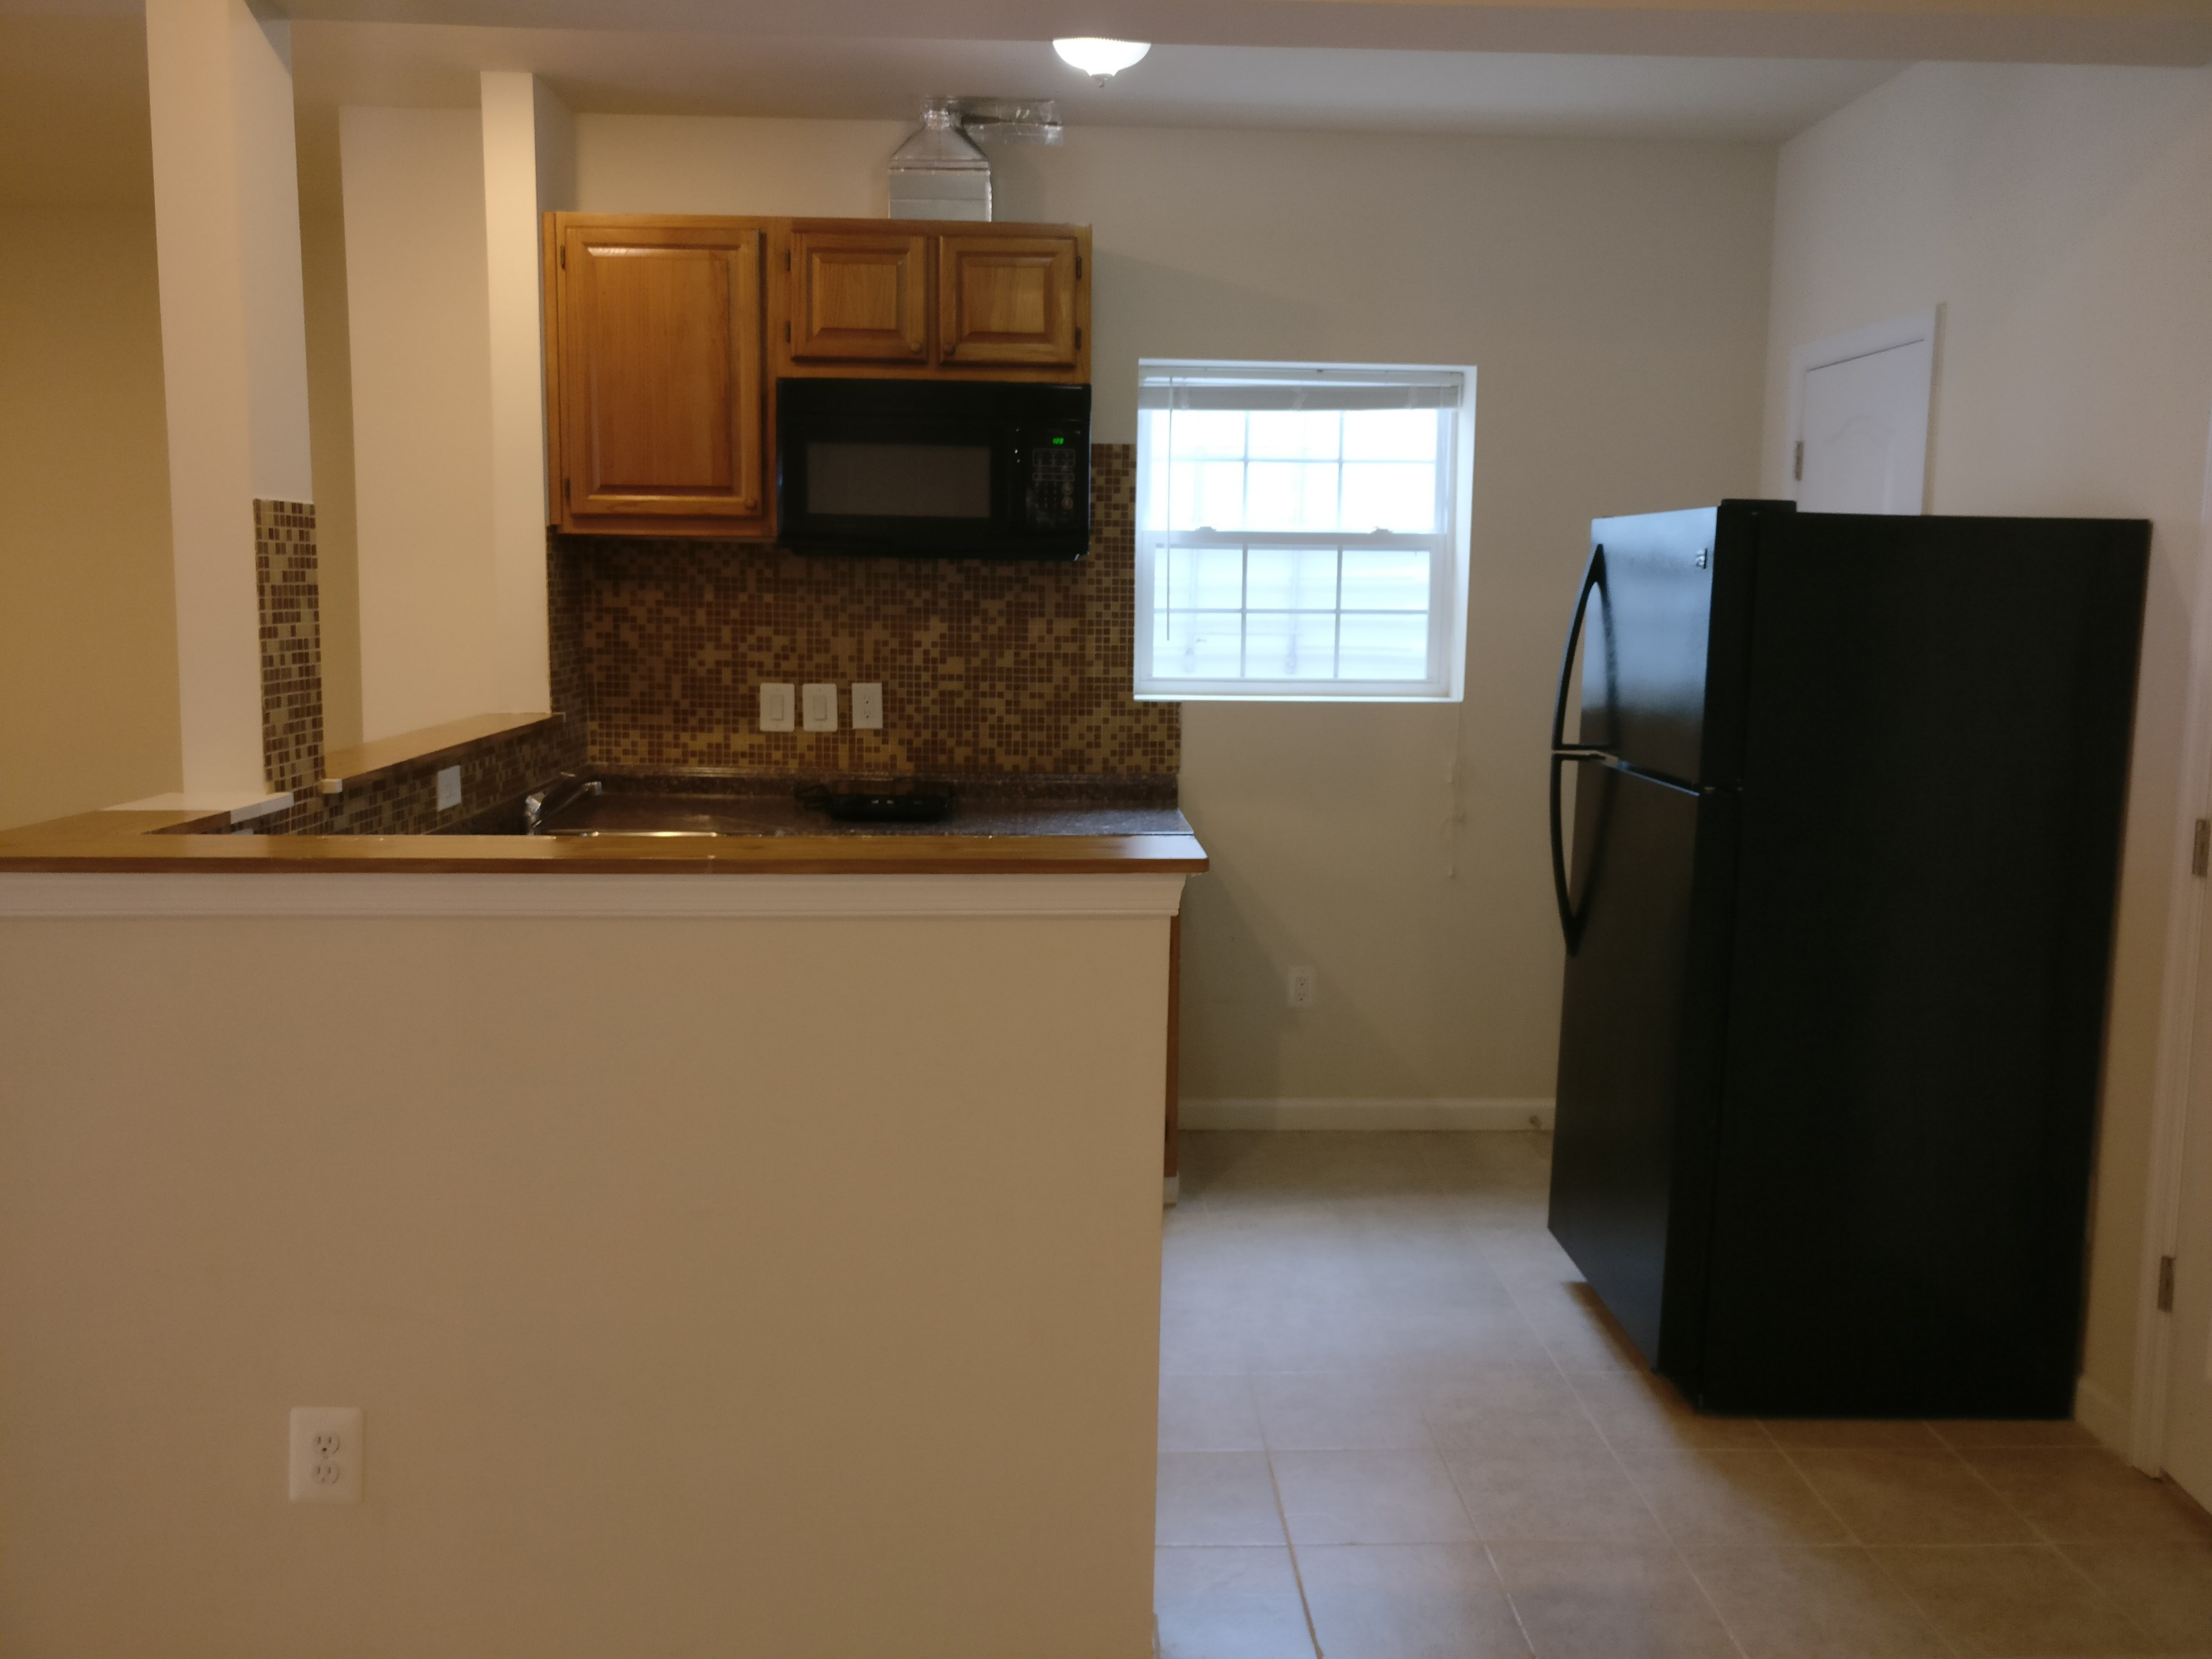 basement approx 1400 sqft for rent in ashburn va 1200 mo 1 bhk